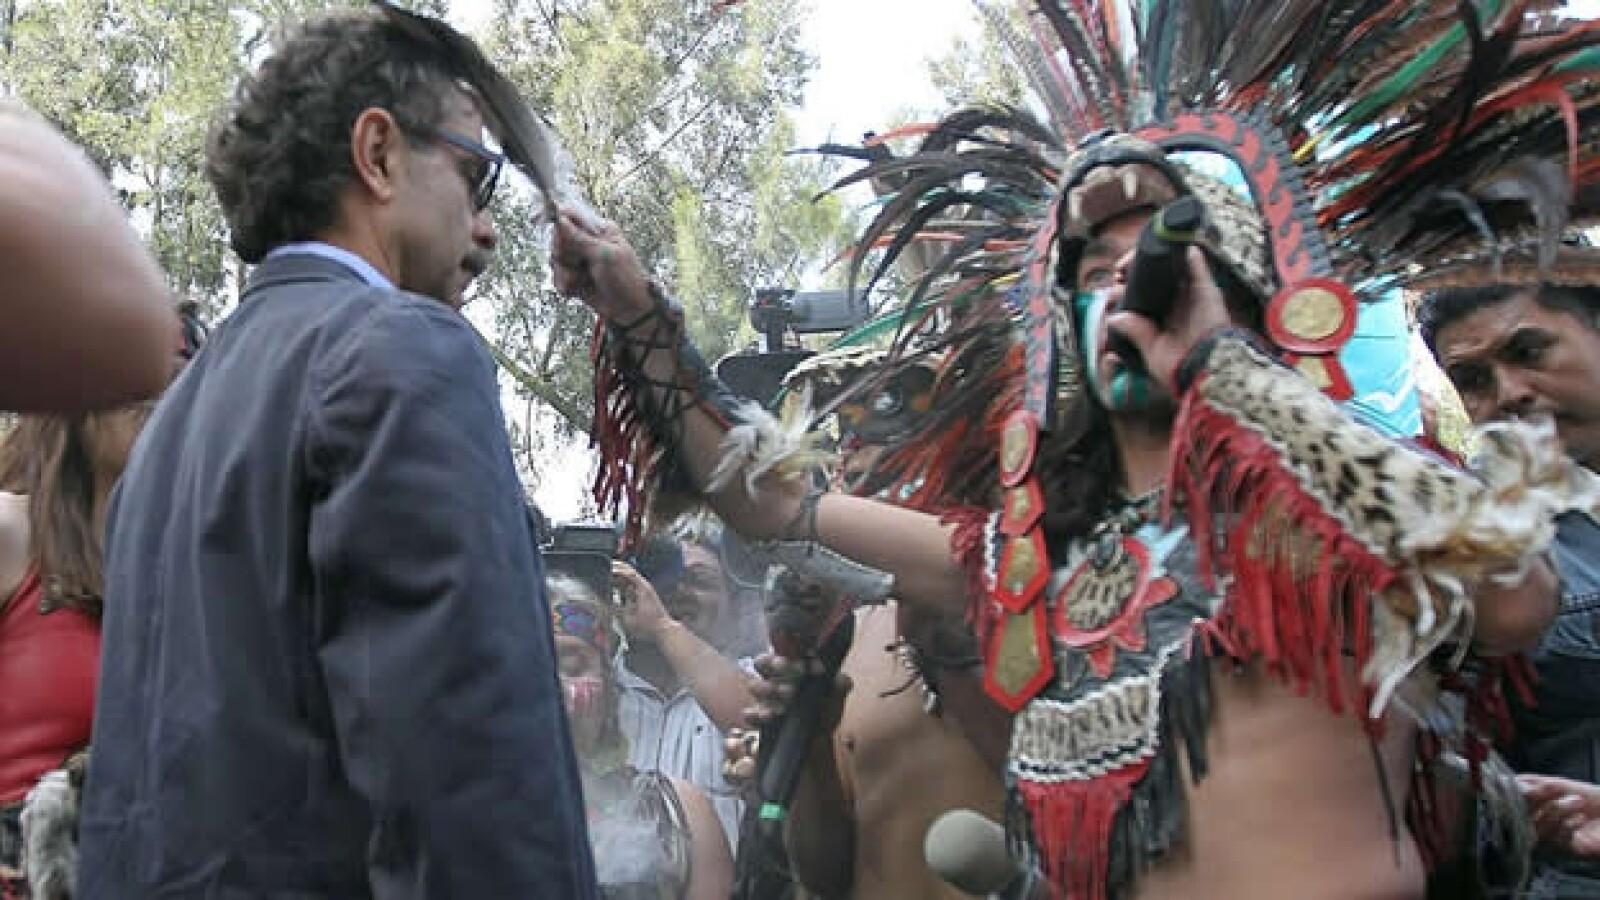 Gabriel Quadri visitó Xochimilco, ahí representantes de la cultura mexica le dieron un baston de mando